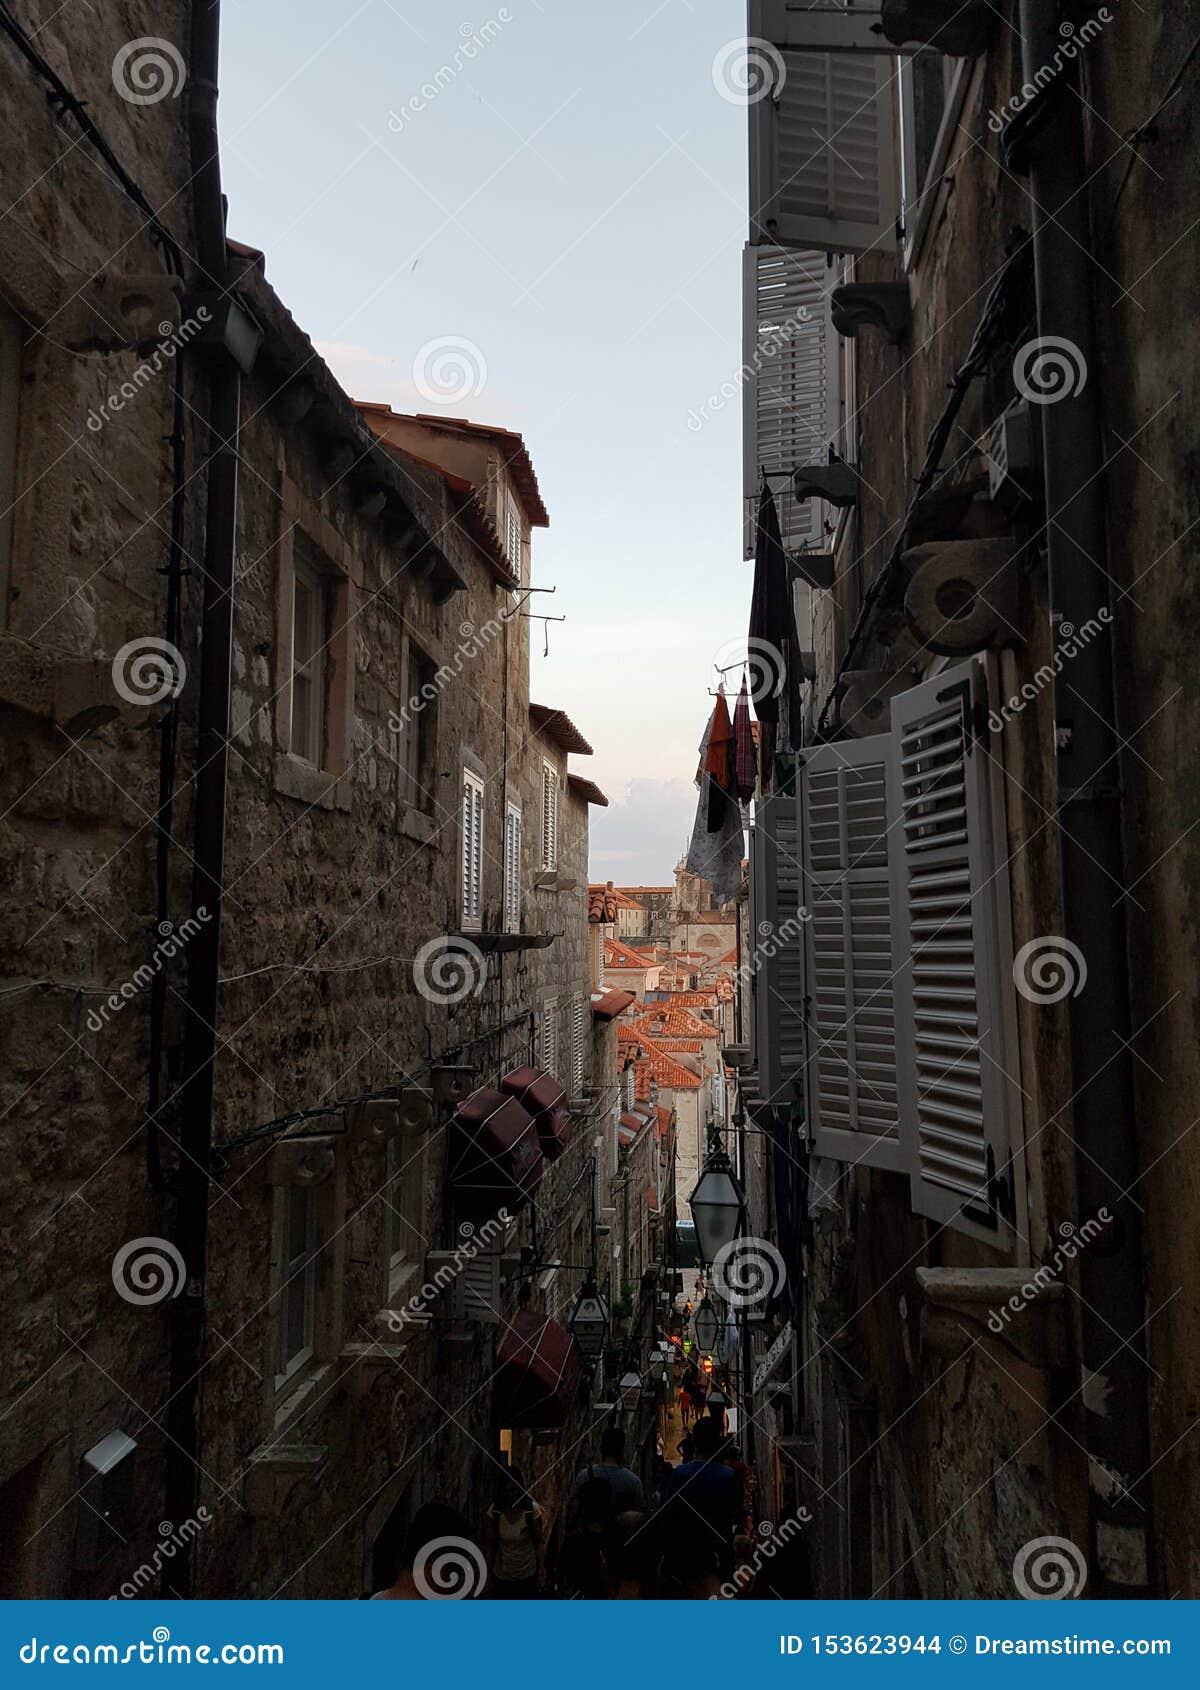 Croatia sunset in old town in dubrovnik